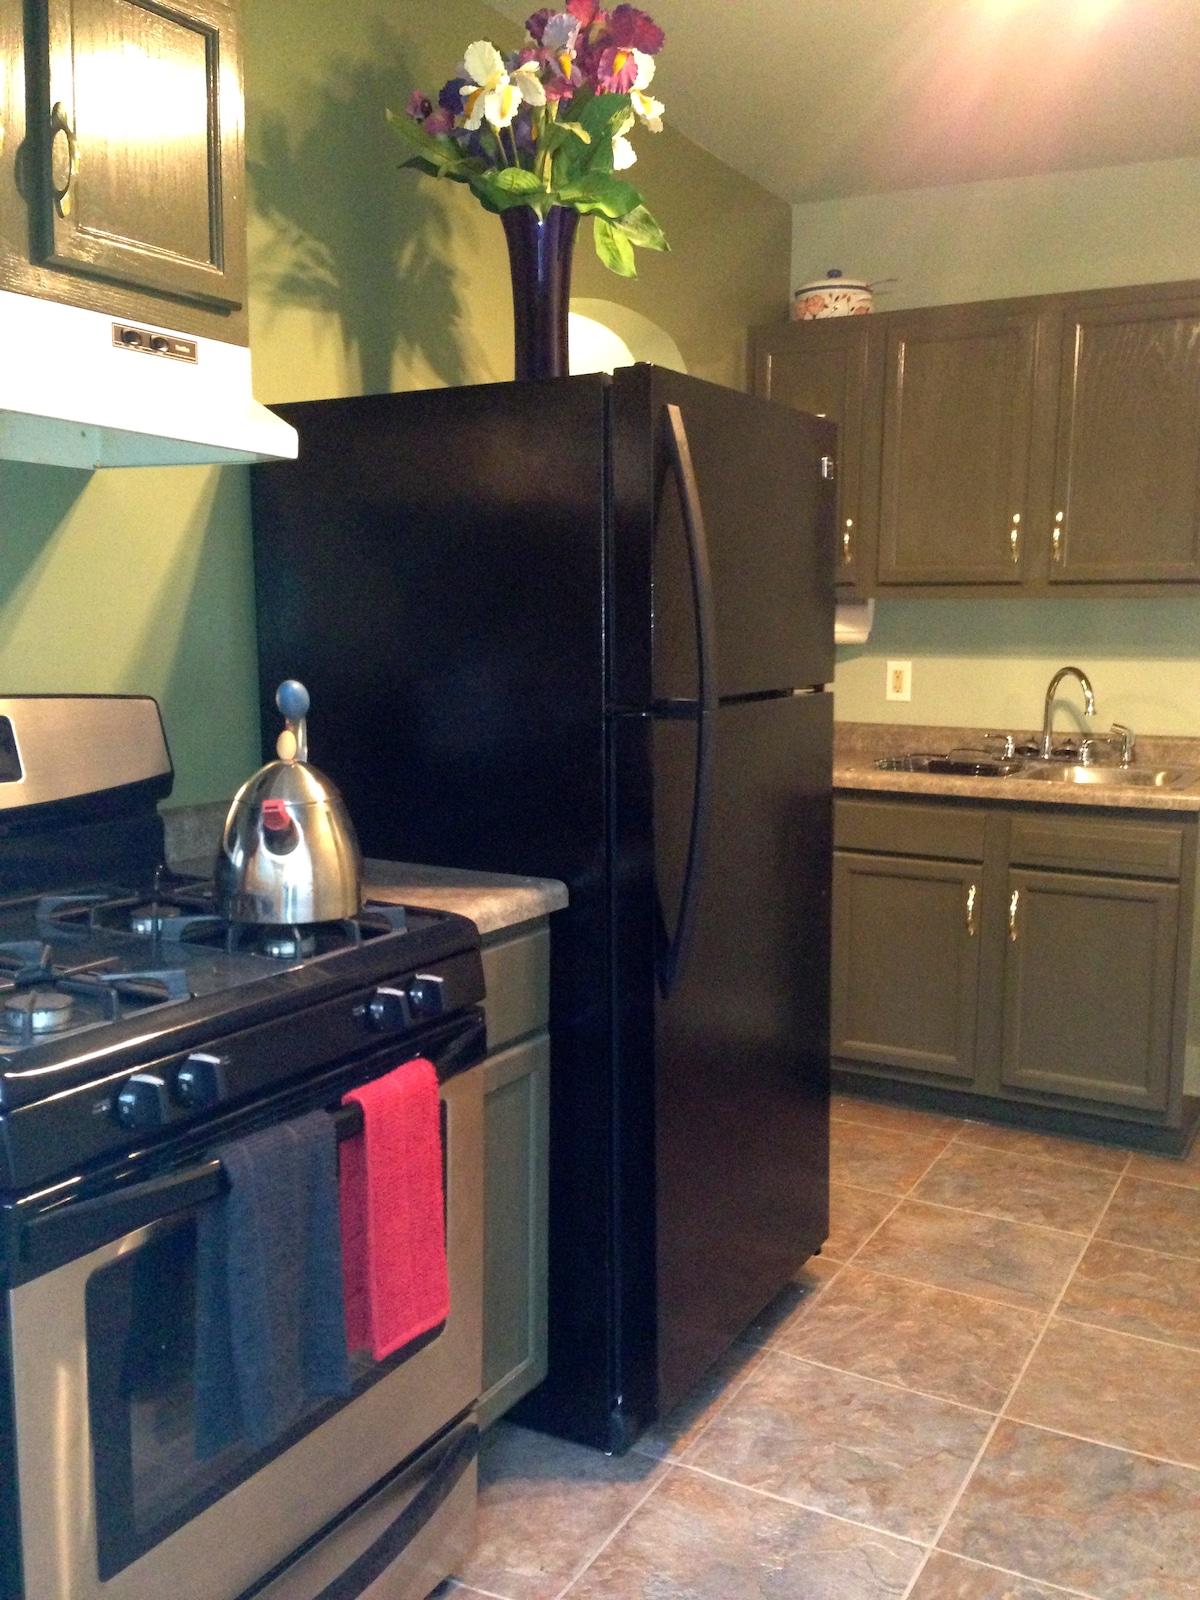 Charming kitchen.